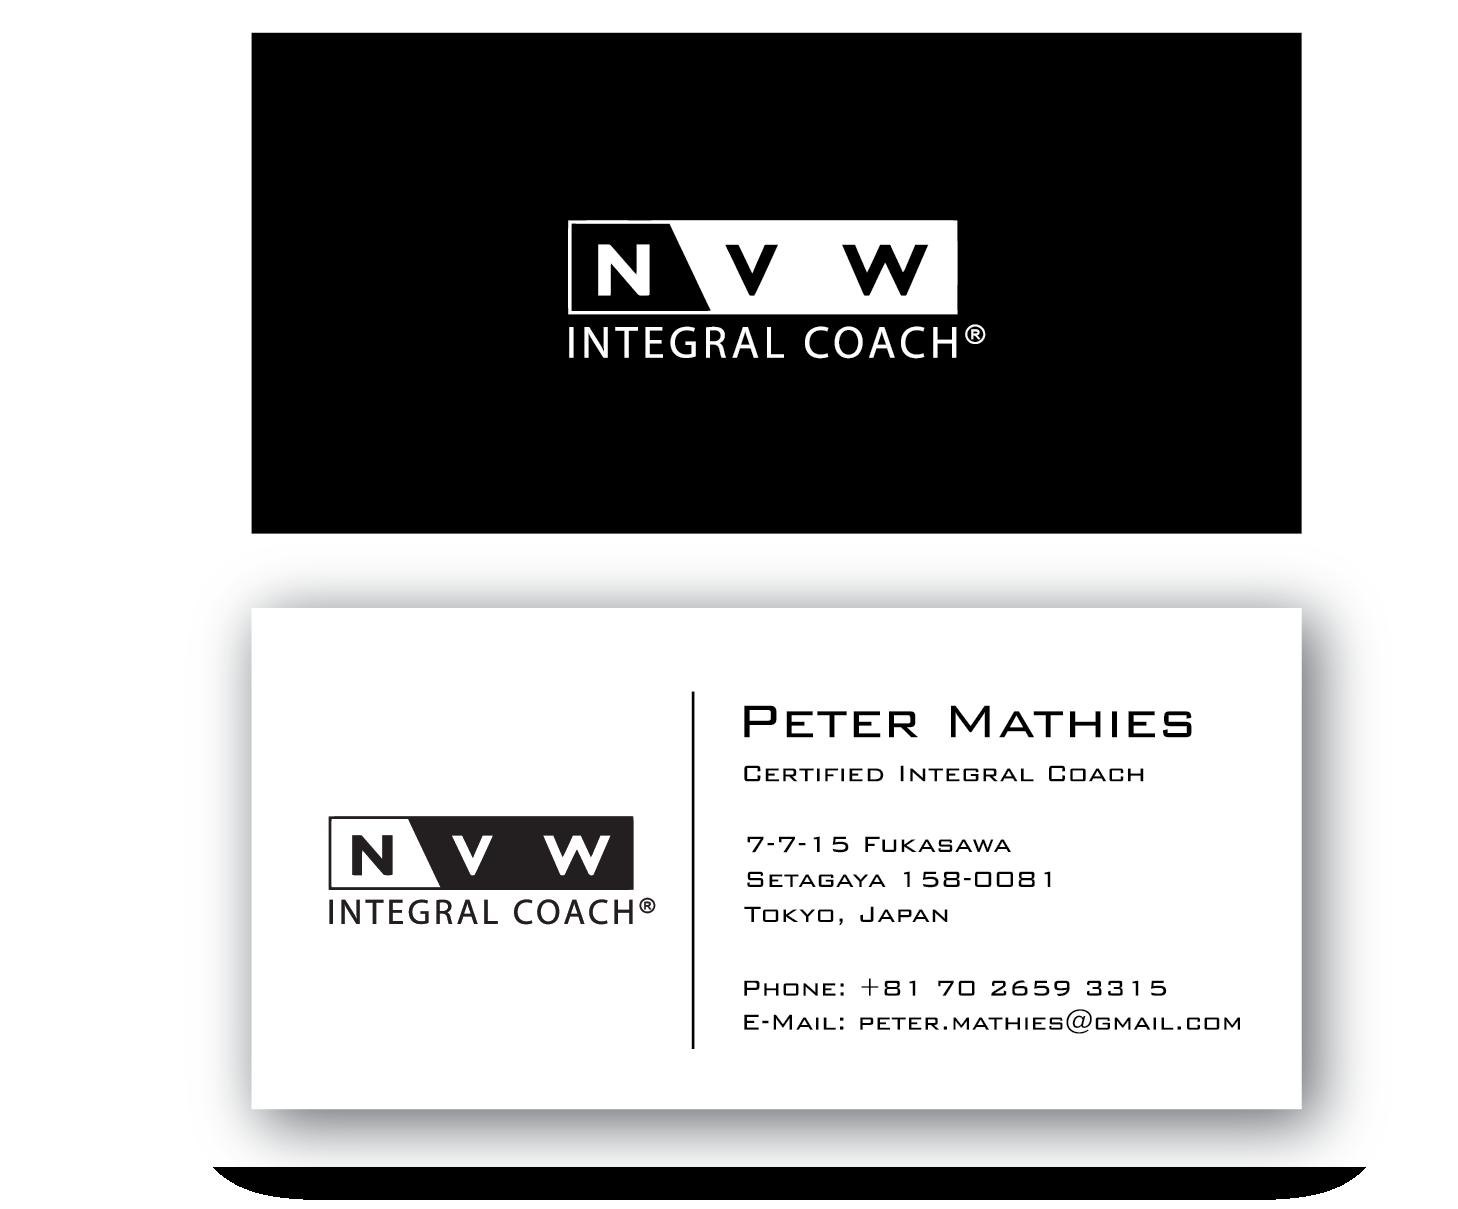 Elegant Professional Life Coaching Business Card Design For Self